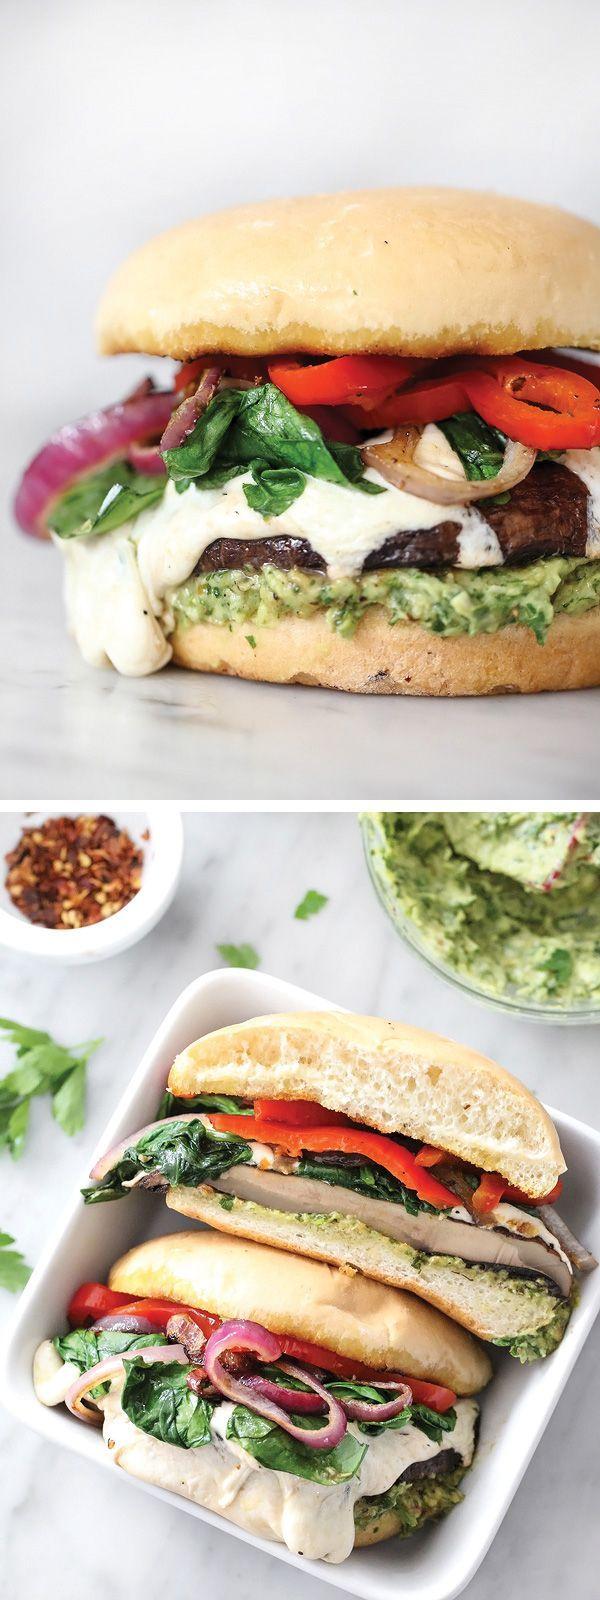 avocado chimichurri in place of mayo flavors this Portobello Mushroom Burger with Smoked Mozzarella  